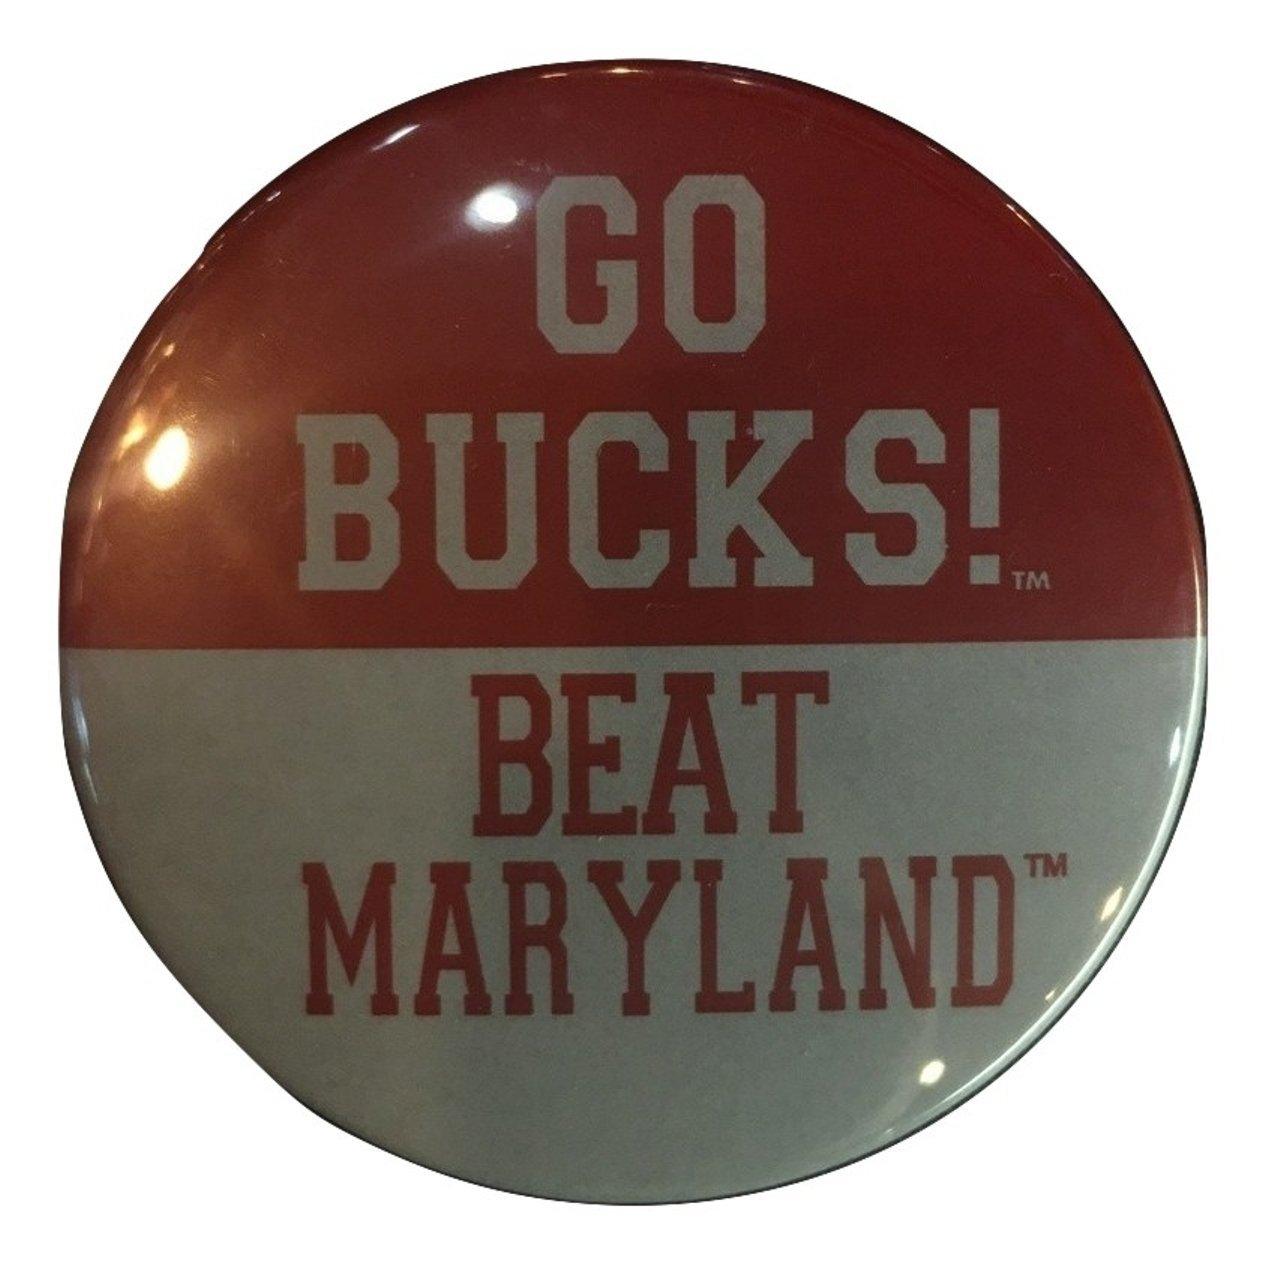 Ohio State Buckeyes Gameday Button, Go Bucks Beat Maryland   B01G4EGUUE